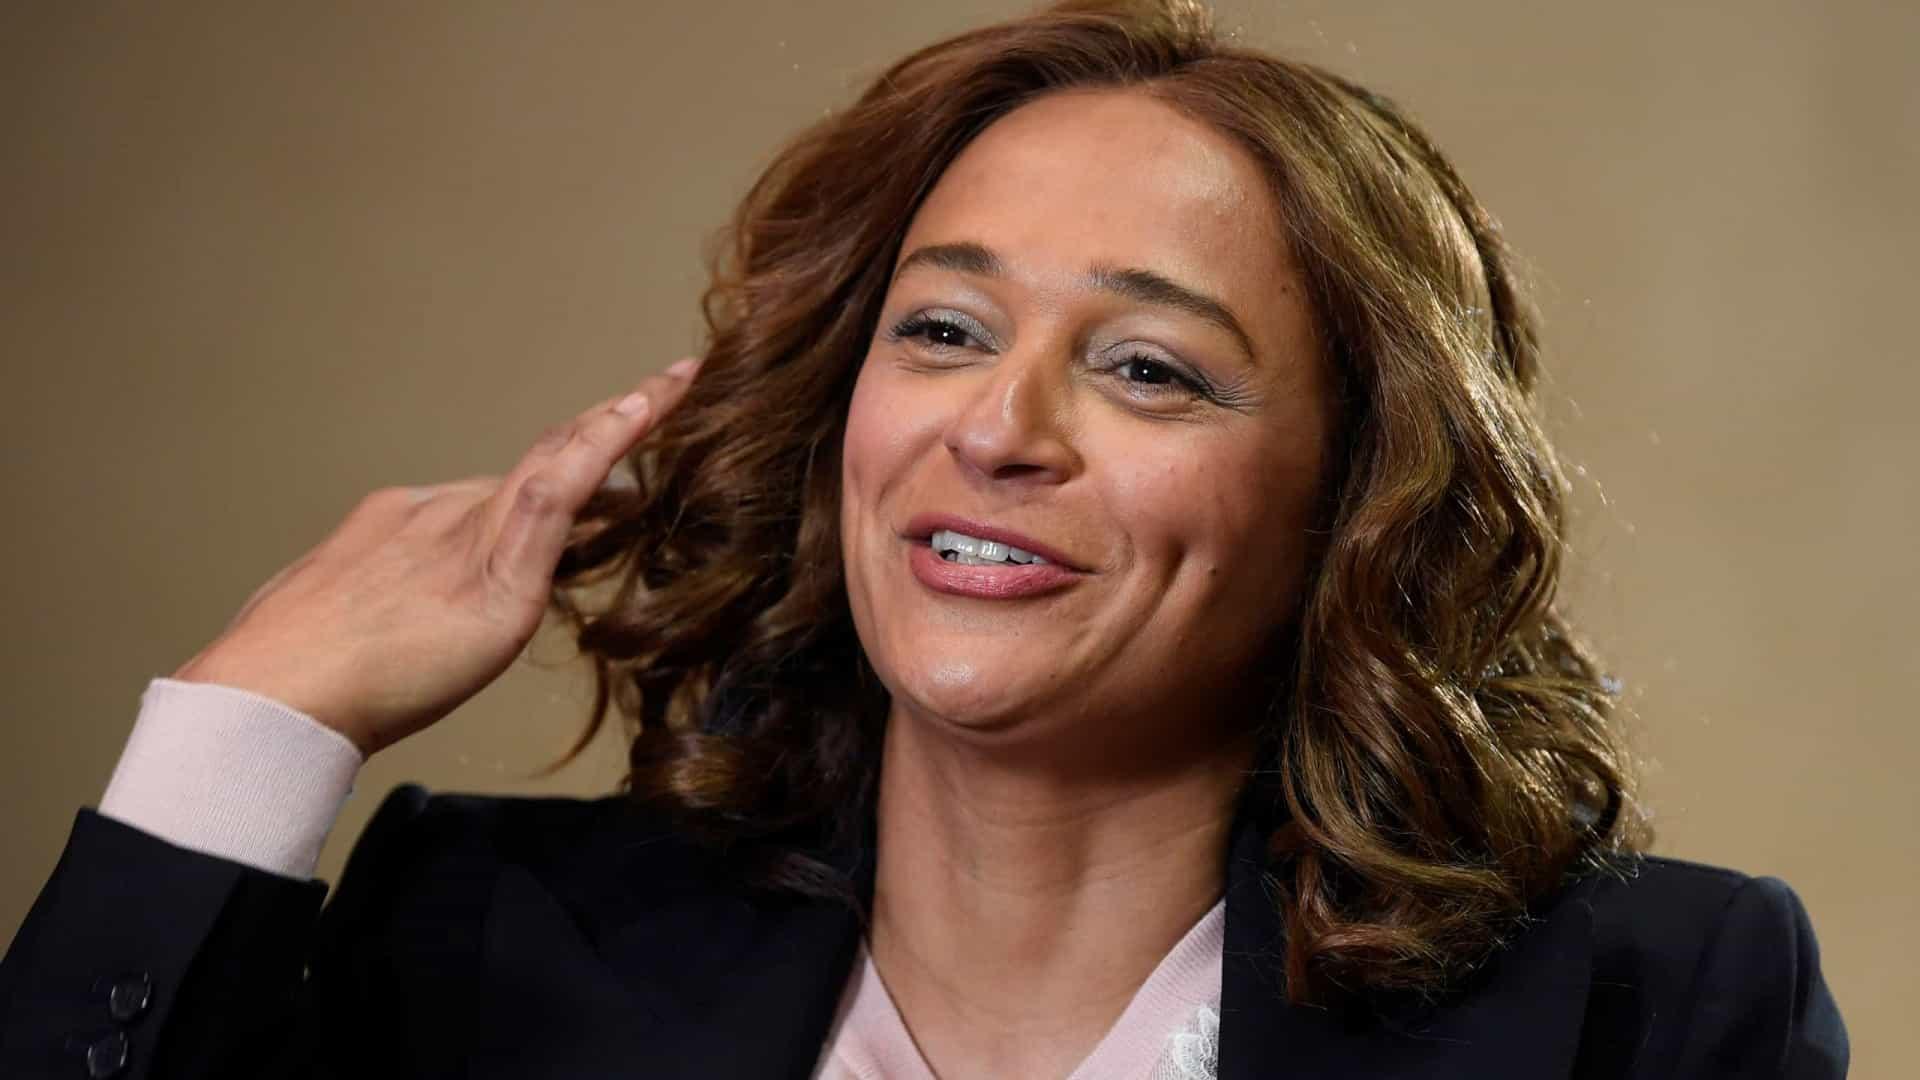 Justiça ordena congelamento das contas bancárias de Isabel dos Santos